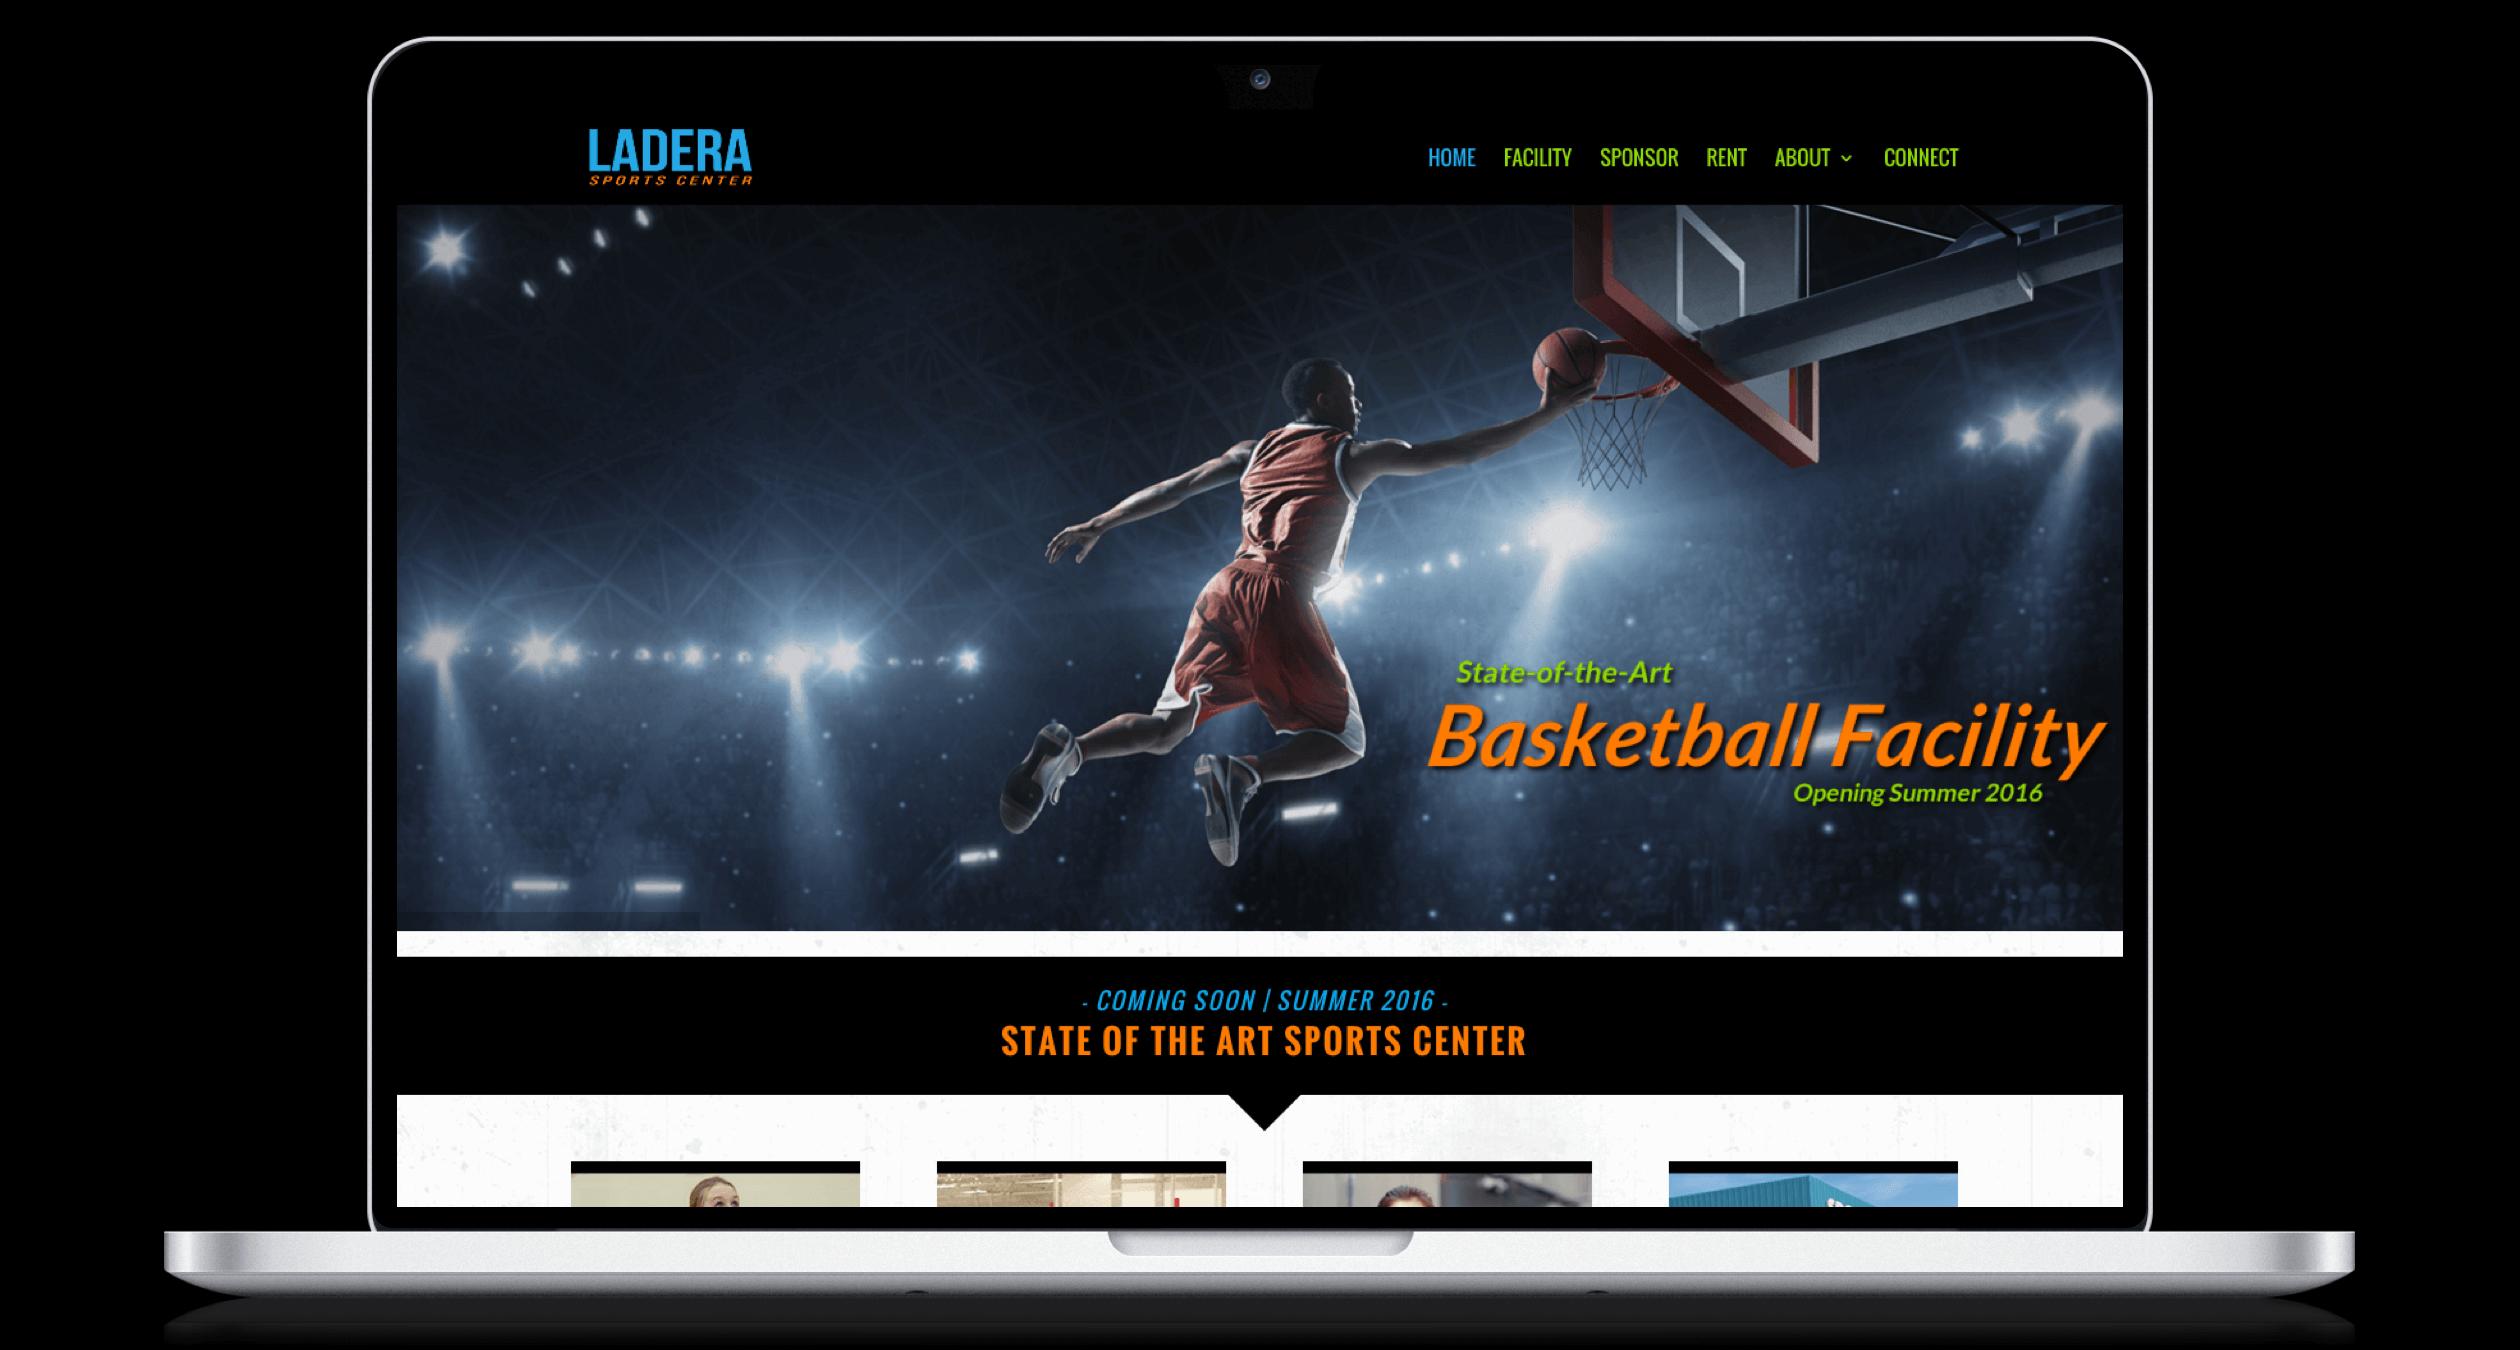 PHX-Web-Agency-Ladera-Sports-Center-Website-Design-Before